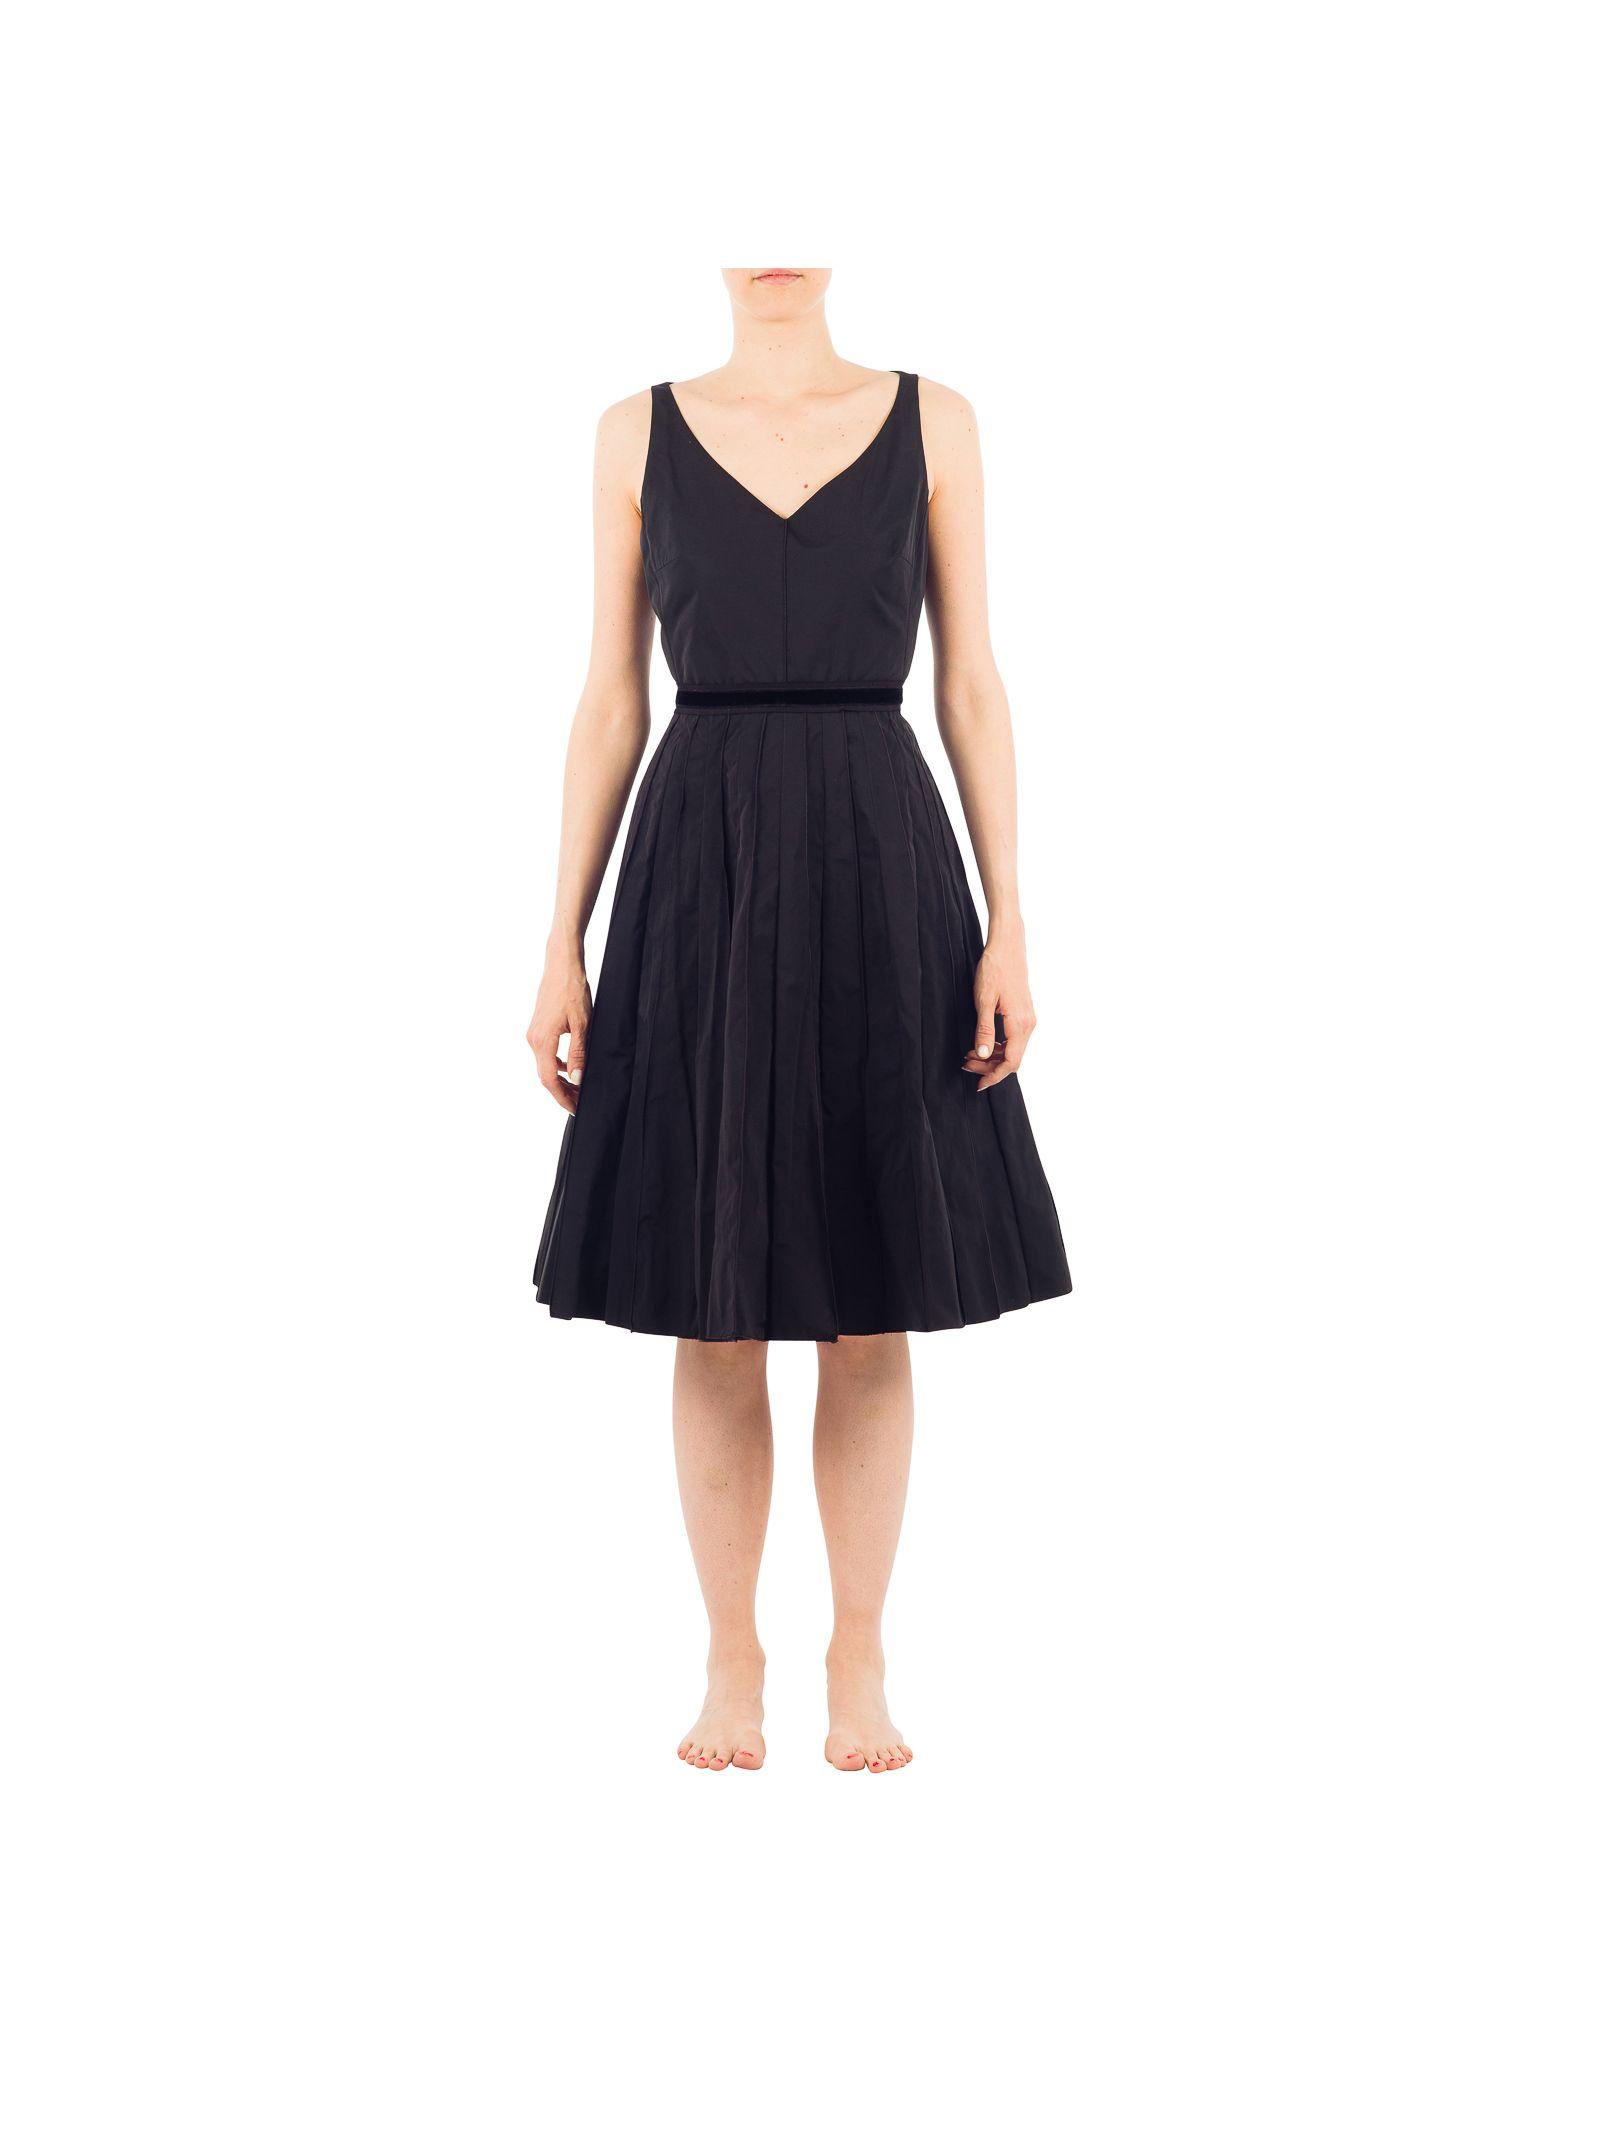 marc jacobs female marc jacobs black polyester dress